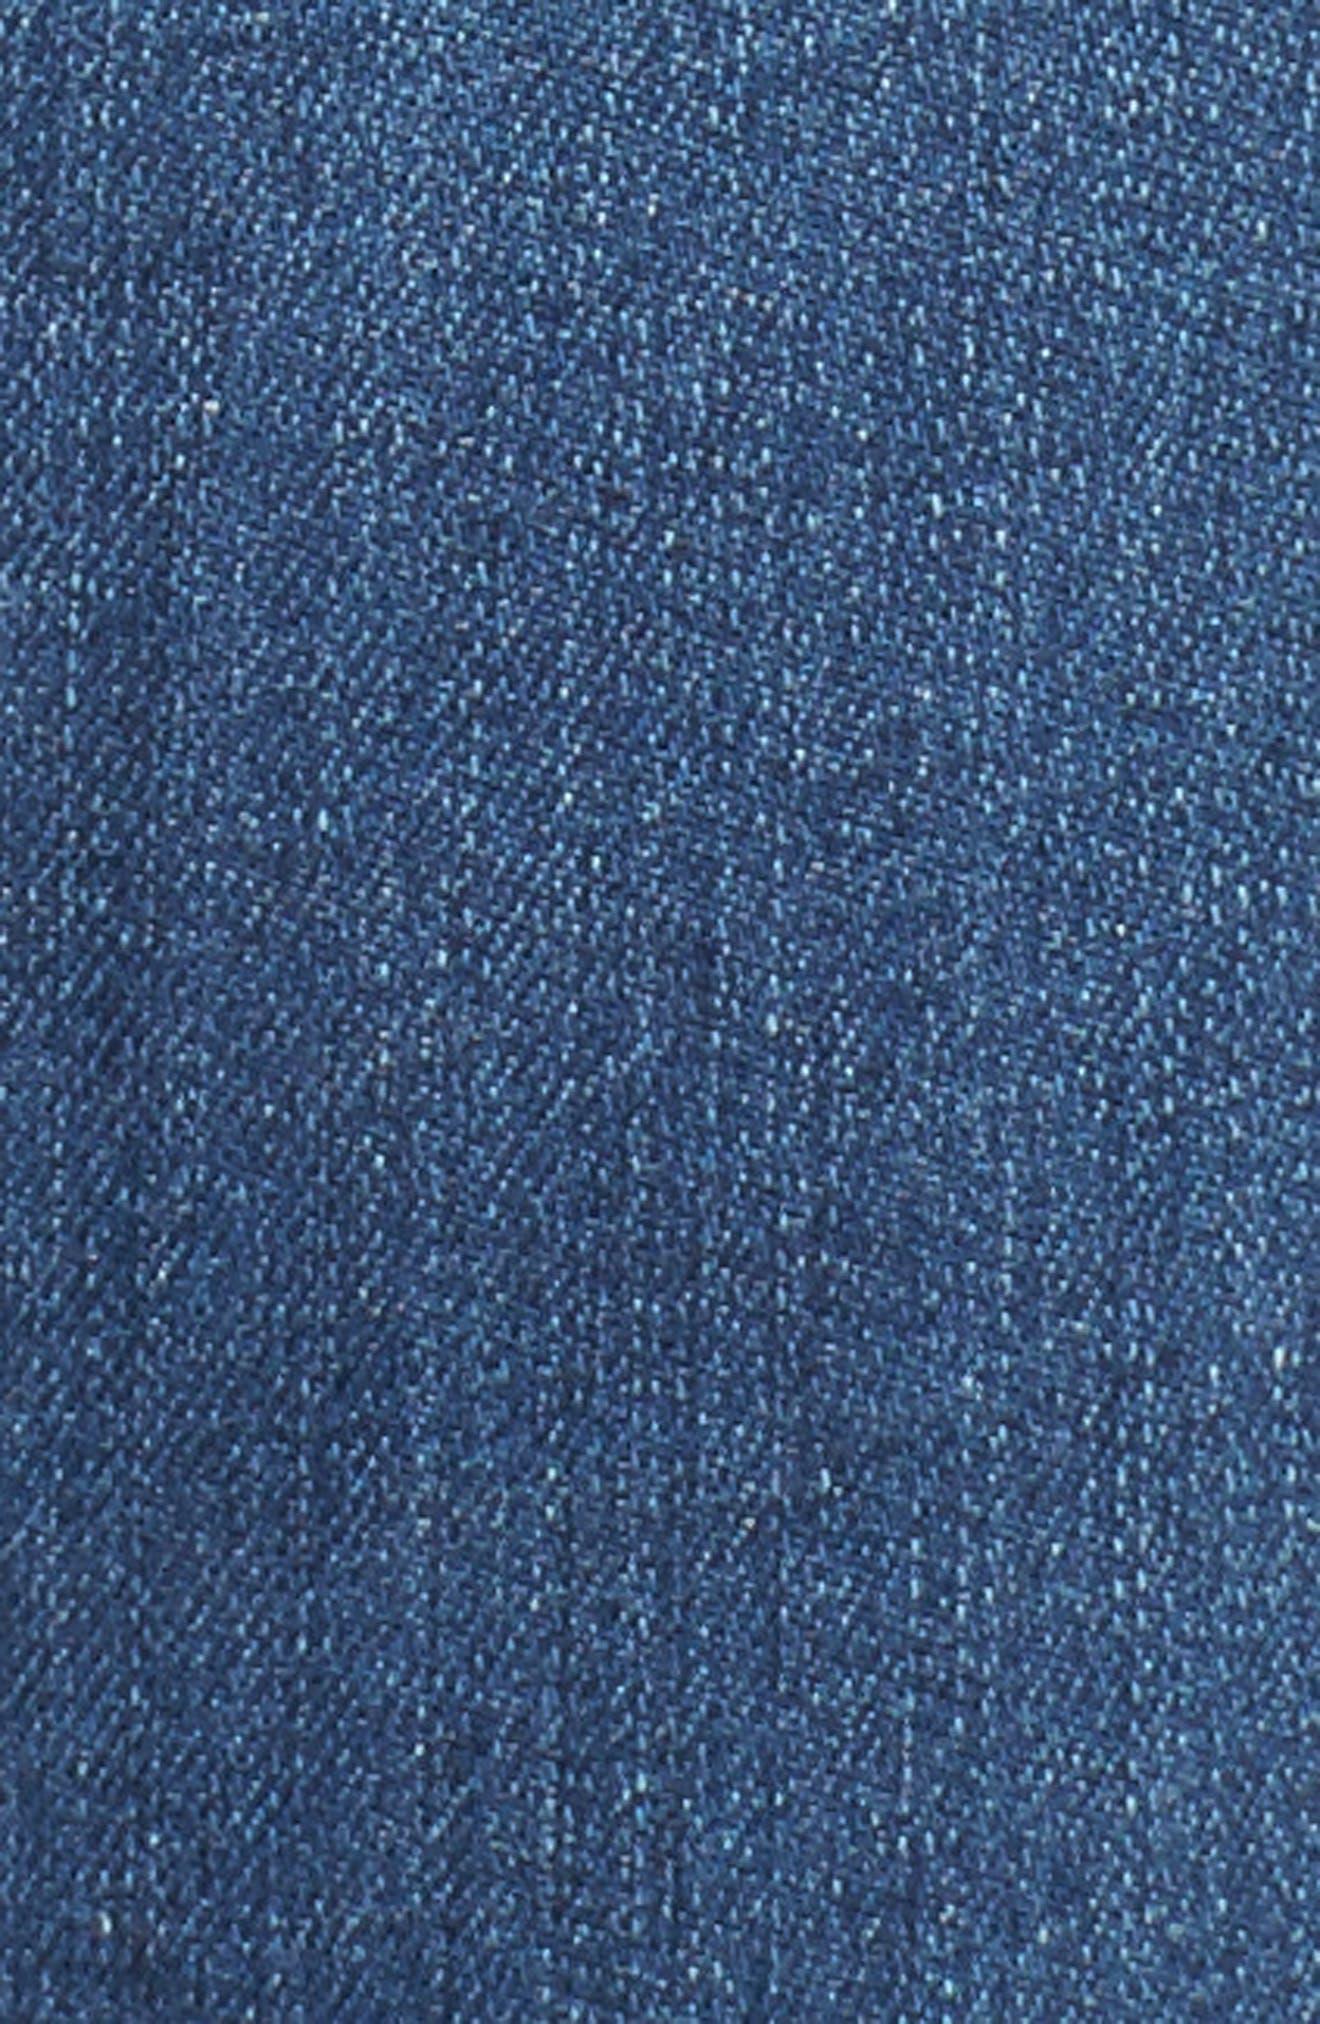 Prima Crop Skinny Jeans,                             Alternate thumbnail 5, color,                             Indigo Viking